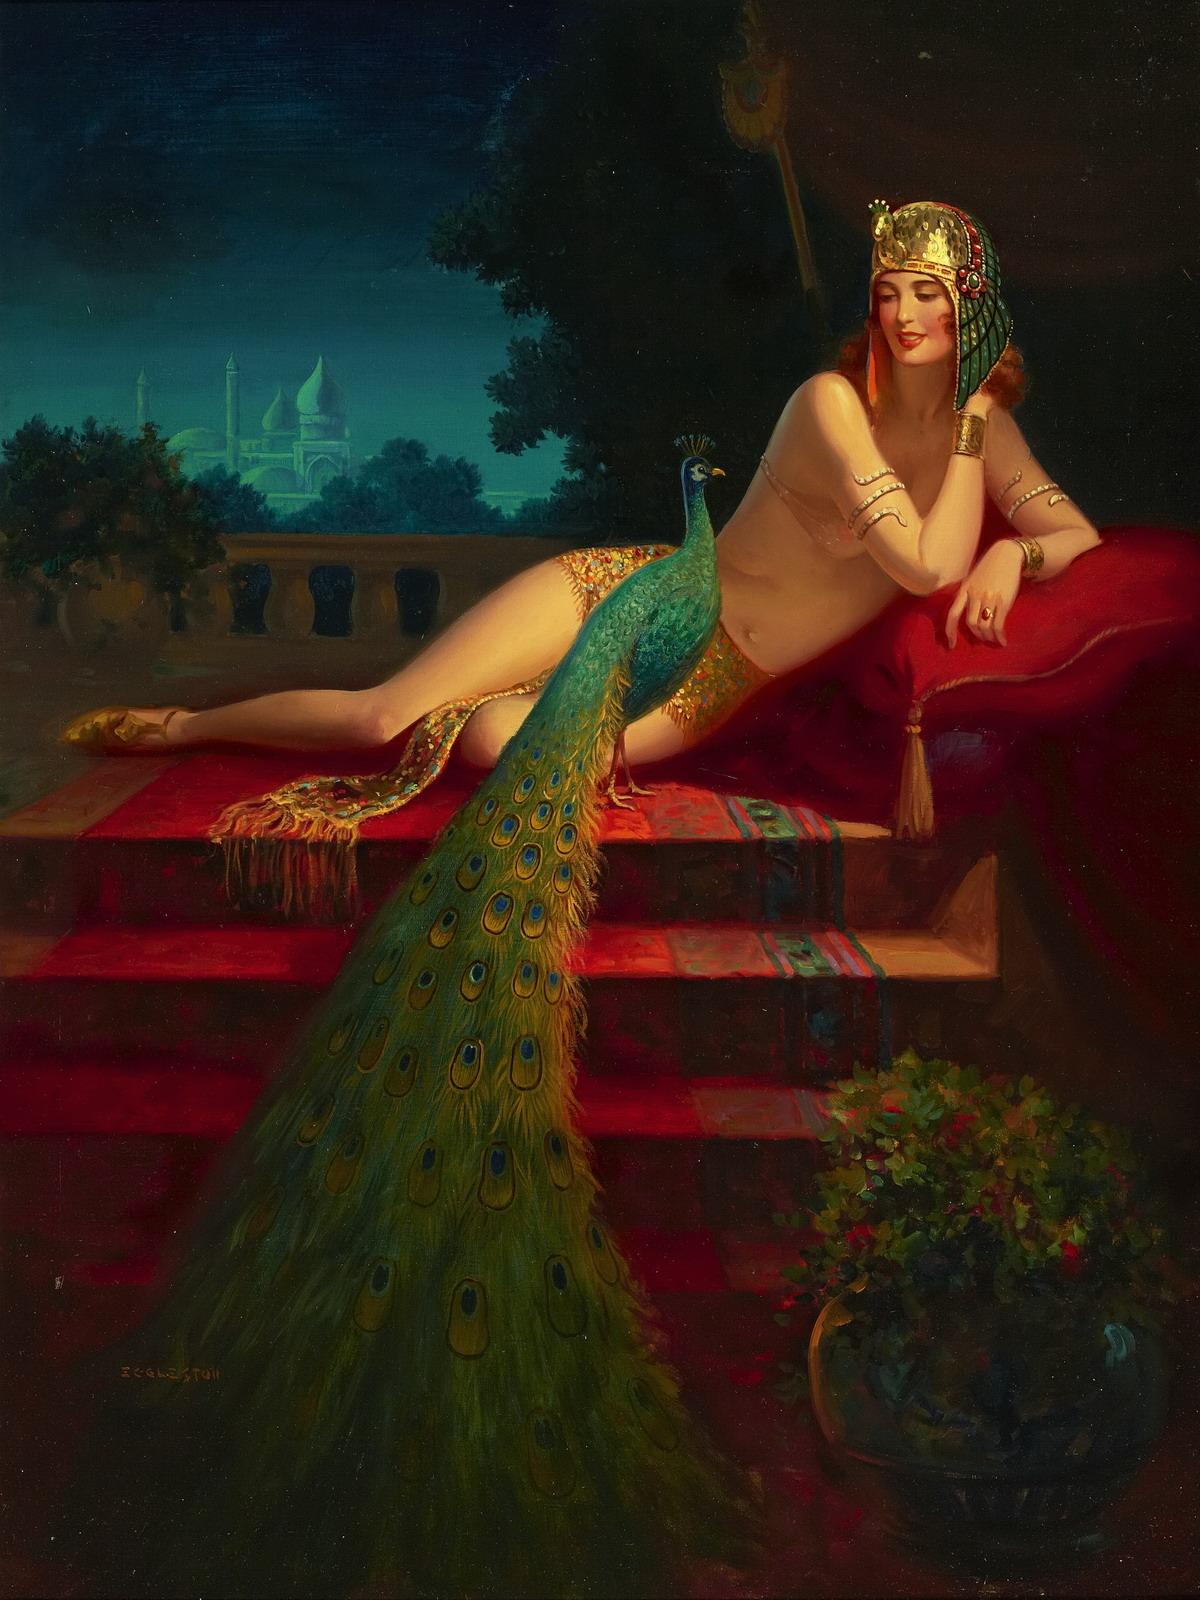 Kleopátra mint pin-up girl (forrás: Wikipedia)